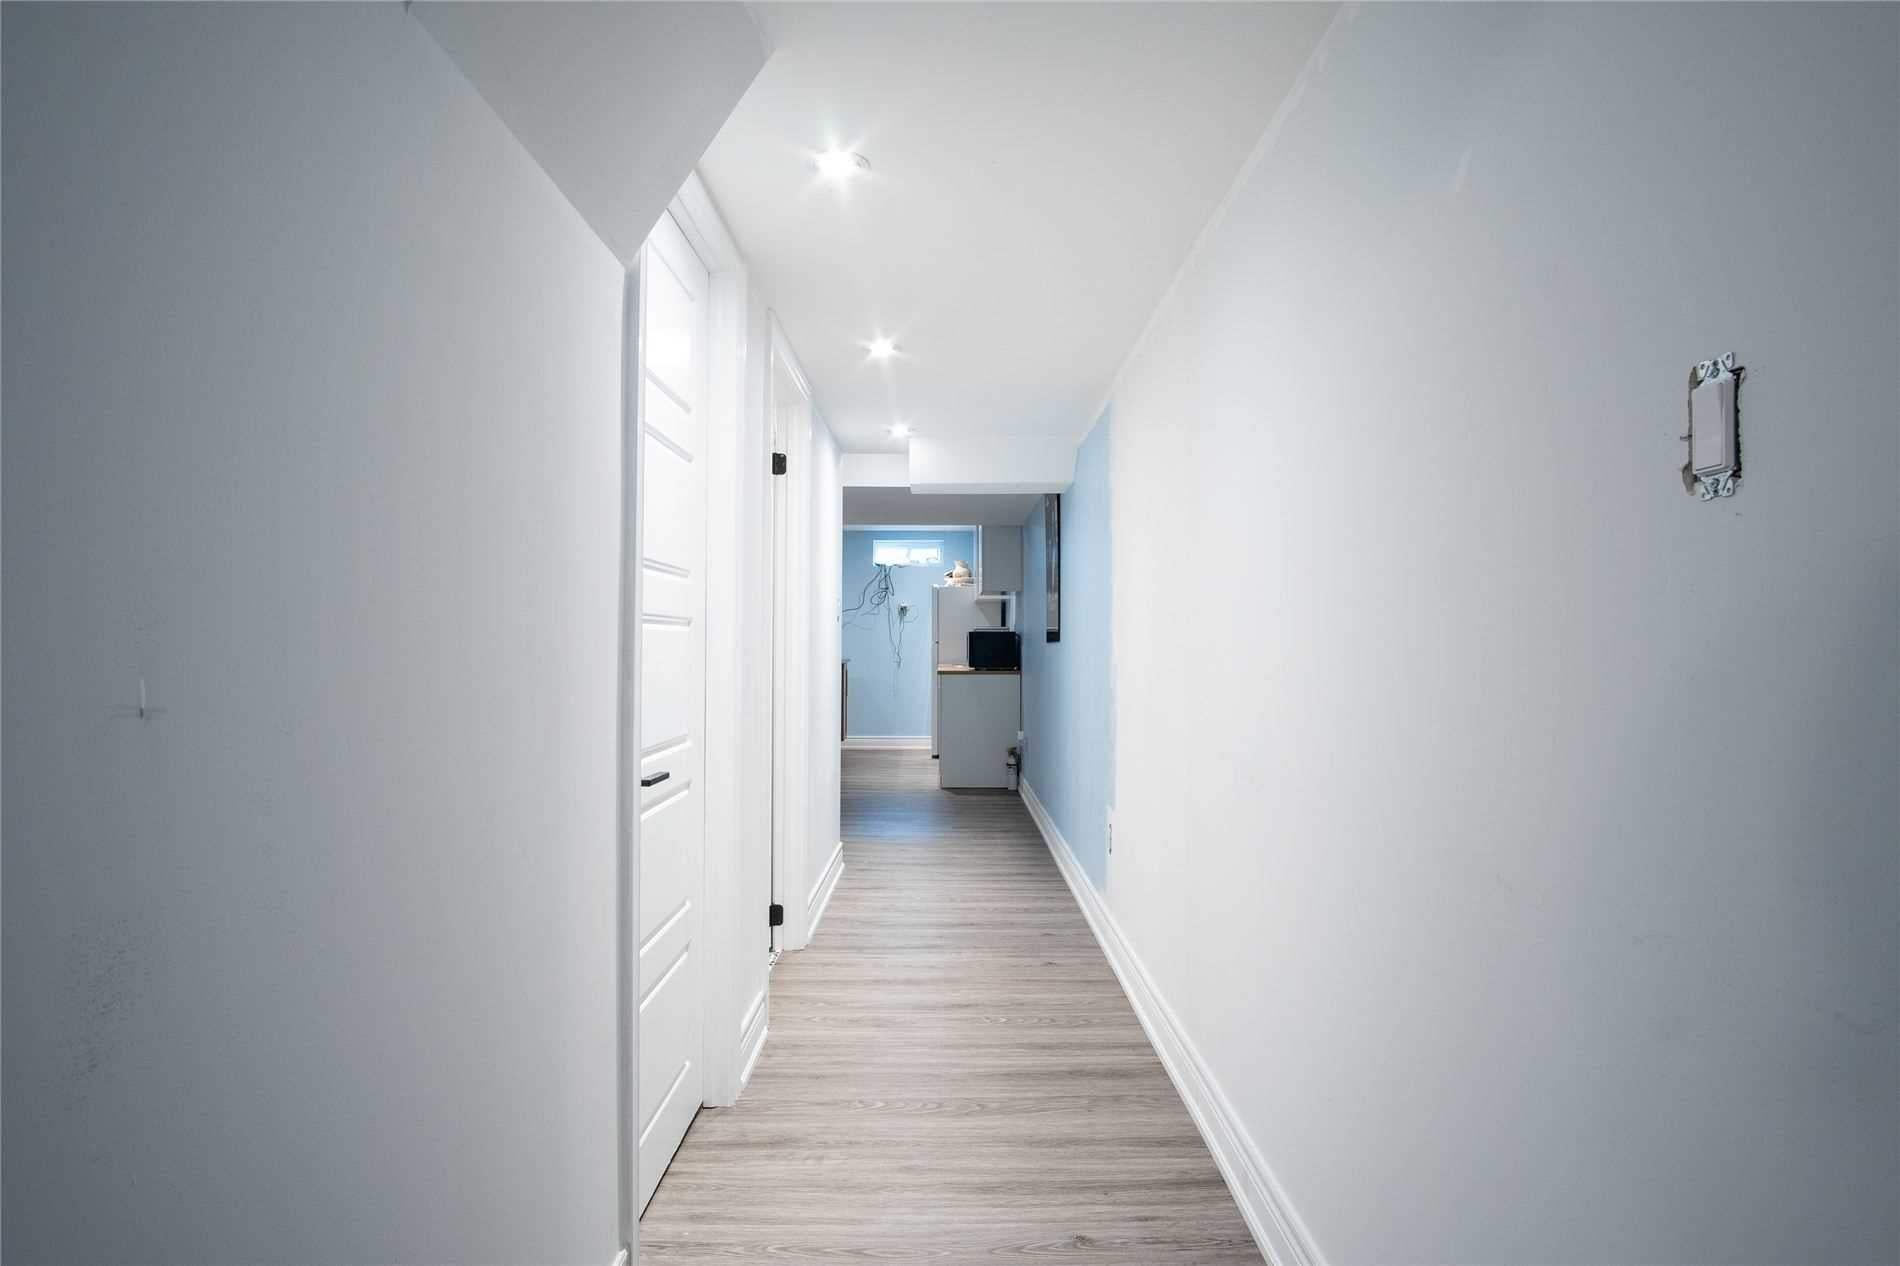 827 Biggar Hts - Coates Detached for sale, 4 Bedrooms (W5400280) - #22